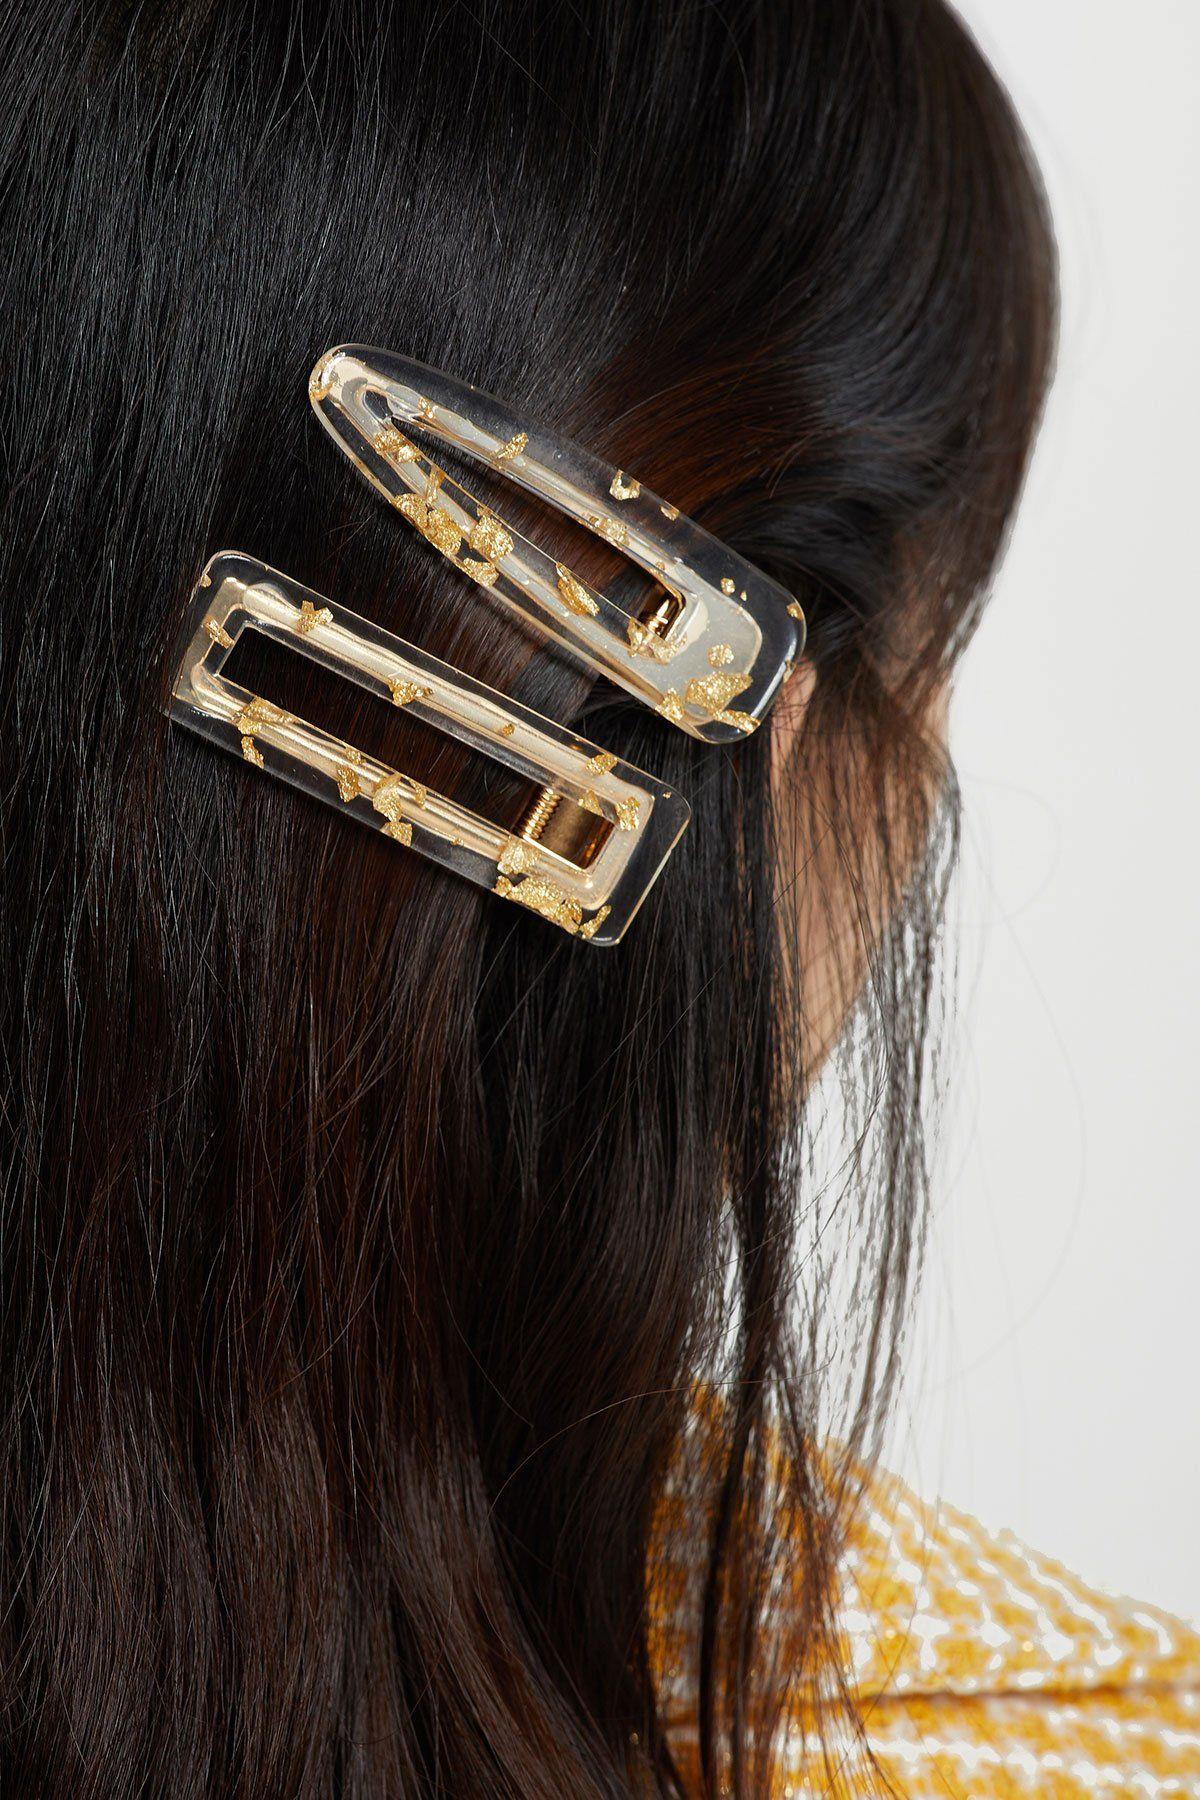 Glitter Resin Hair Clip Wedding Hair Accessories Hair Accessory Barrette Hair Clip Resin Barrette Resin Hair Clip Hair Accessories